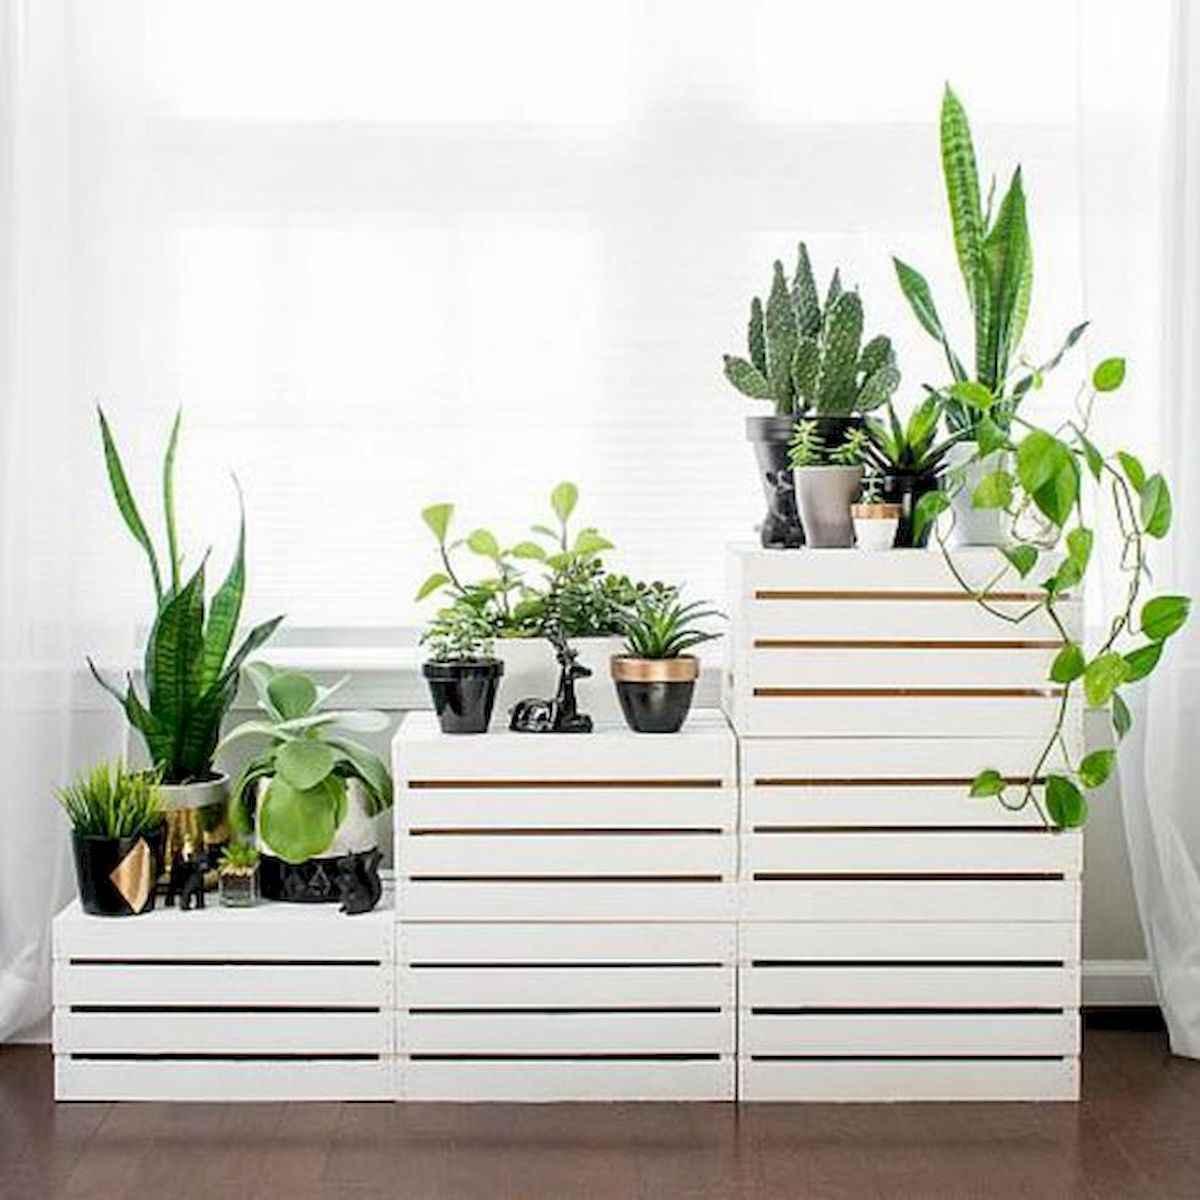 50 Best Indoor Garden For Apartment Design Ideas And Remodel (35)